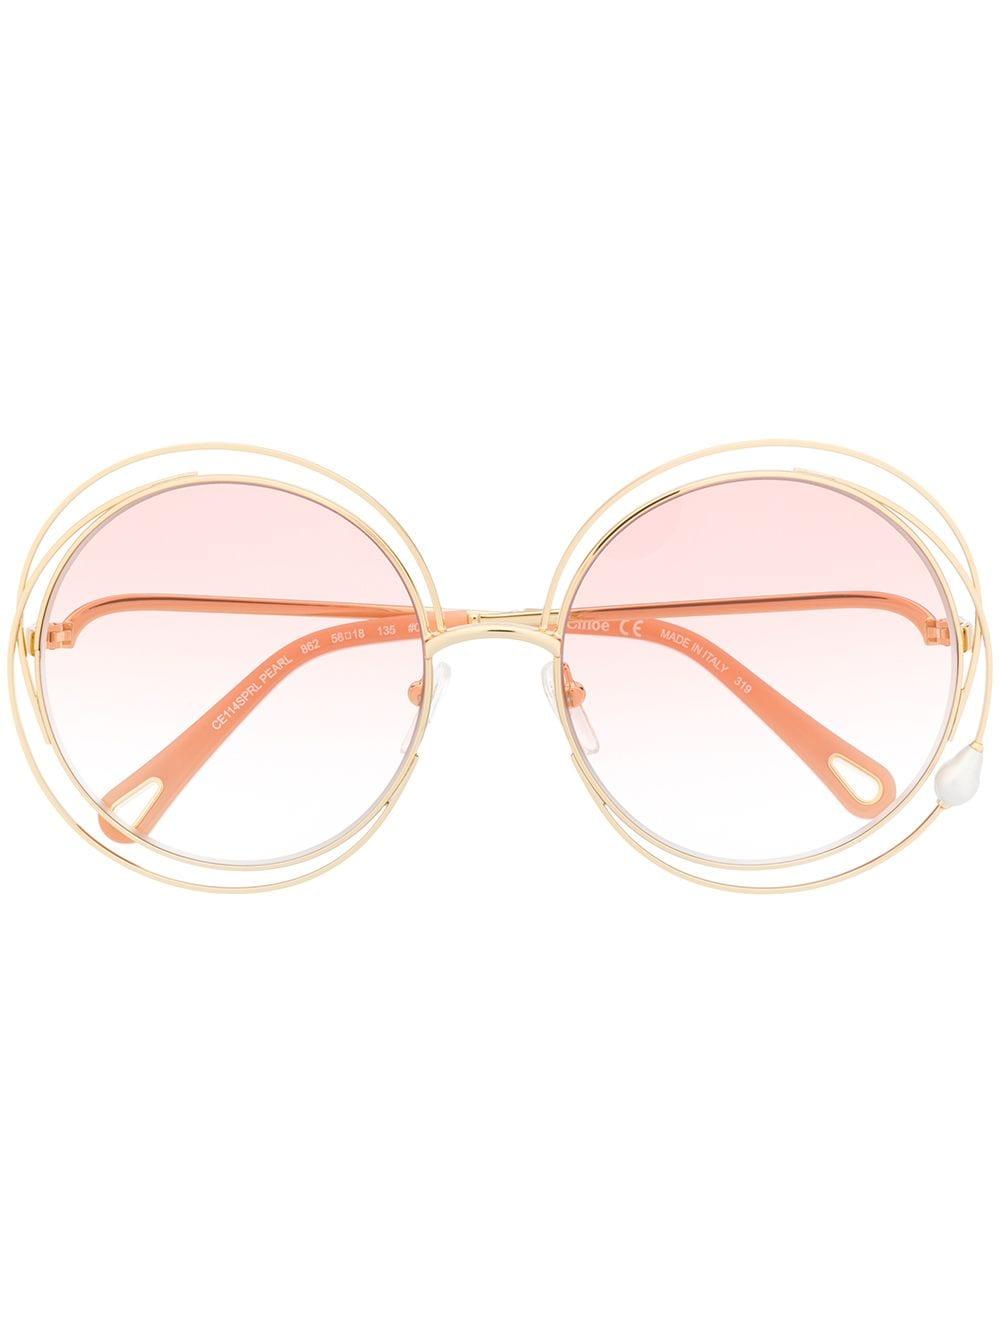 Chloé Eyewear 'Carlina' Sonnenbrille - Gold